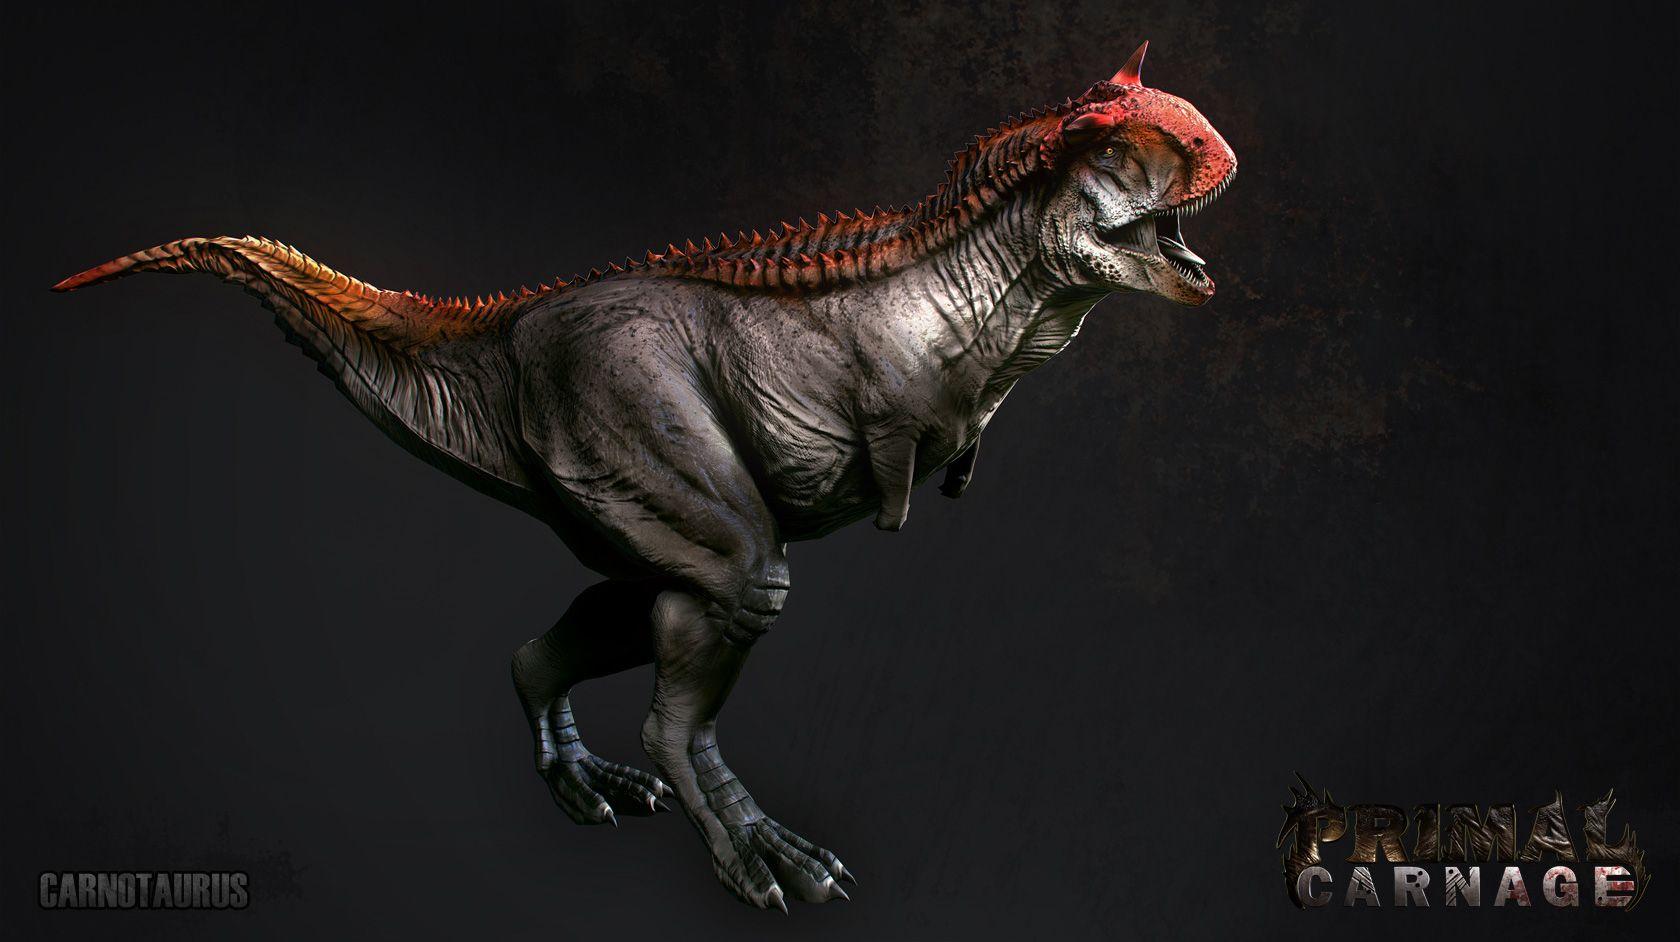 Pin by Antwan Jenkins on Dinosaurs/Prehistoric Mammals | Primal